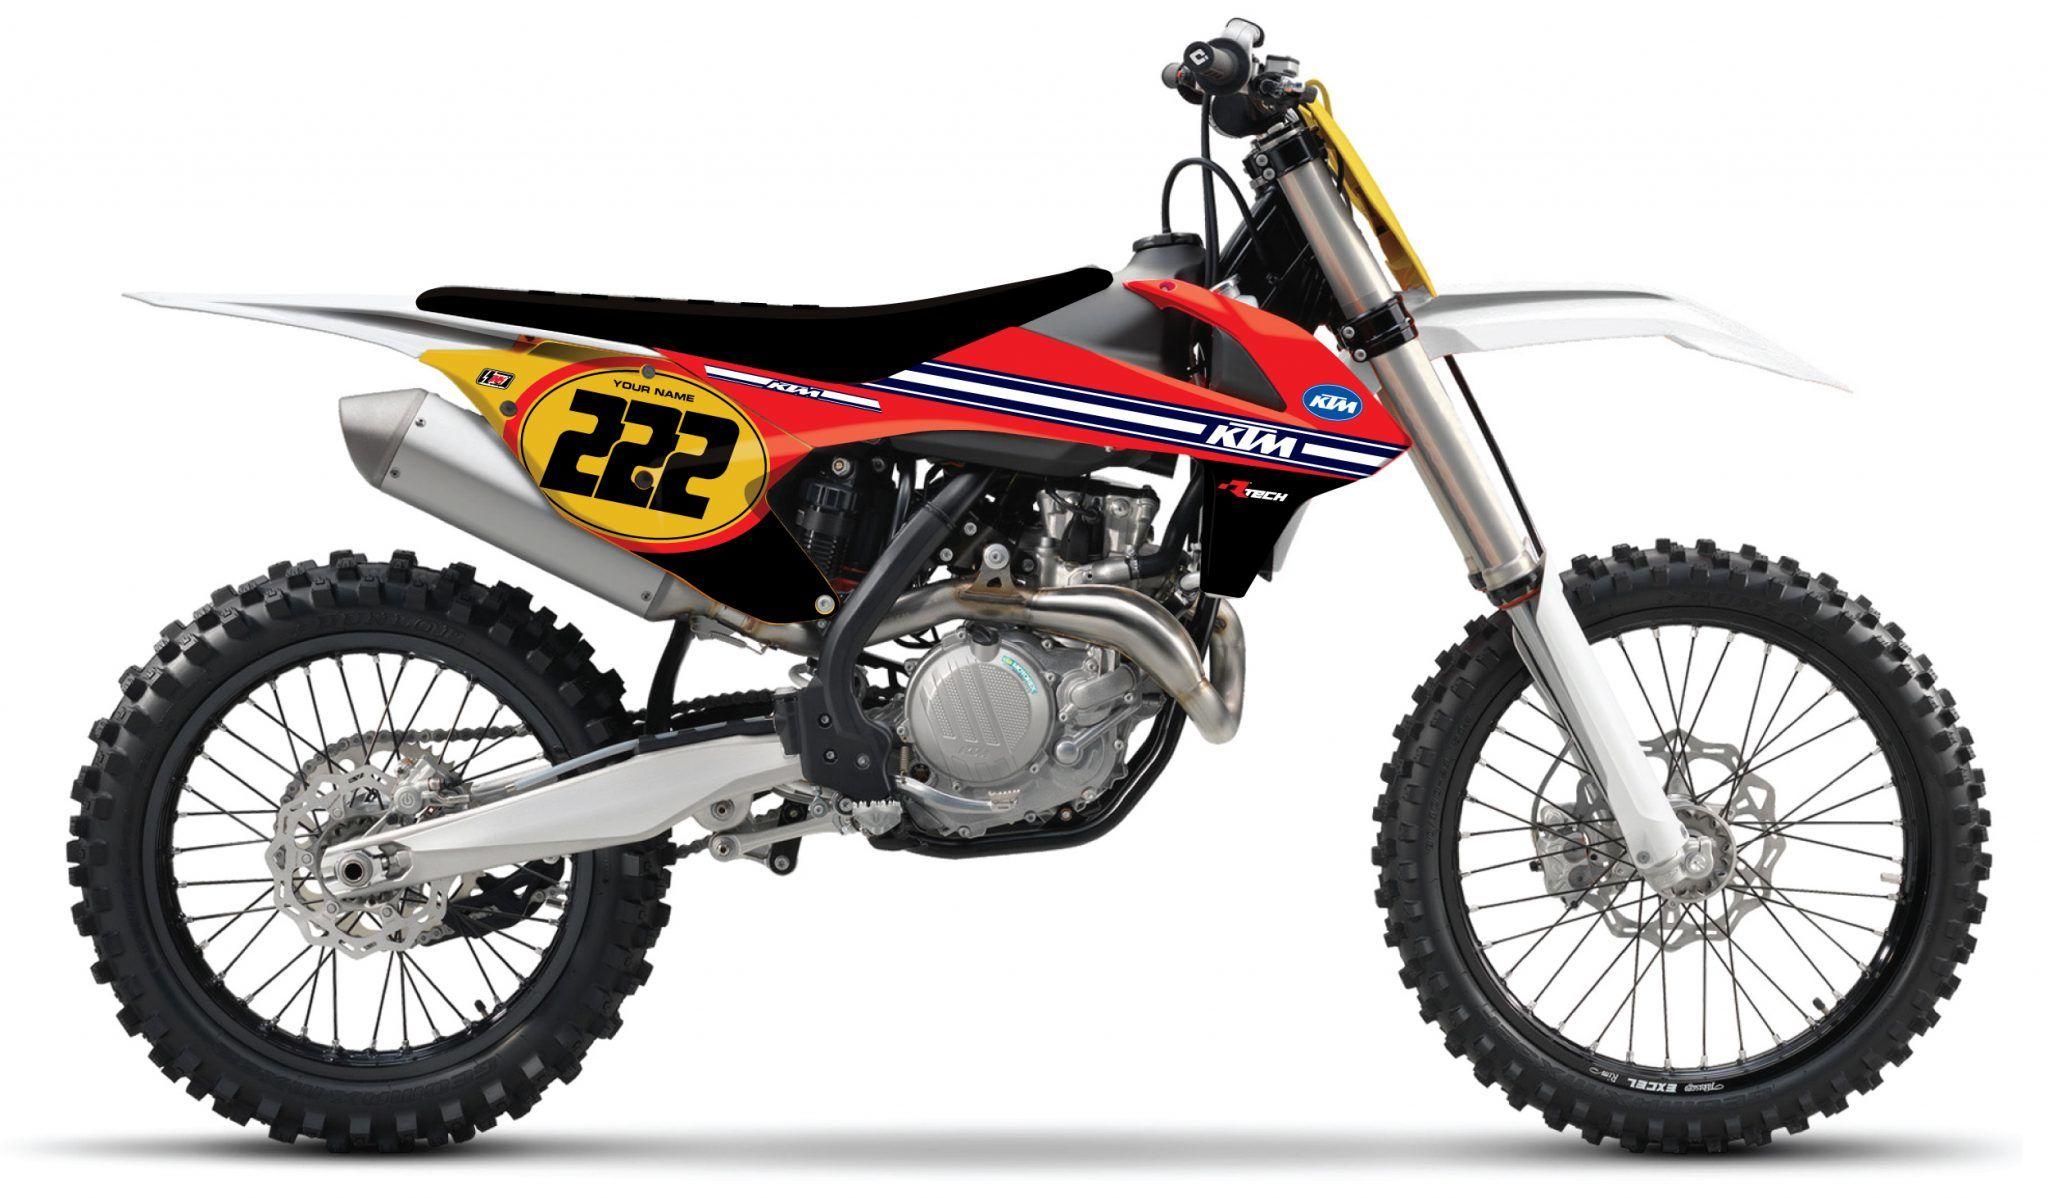 Retro Yamaha Graphics